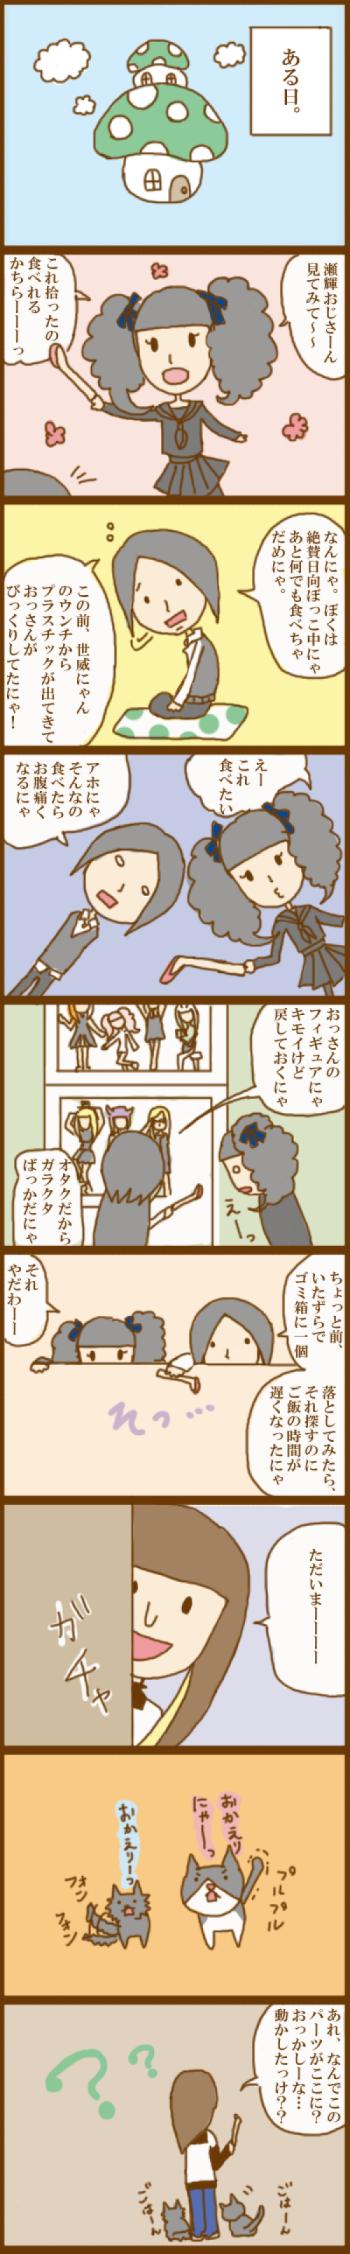 f:id:suzuokayu:20201017211926j:plain